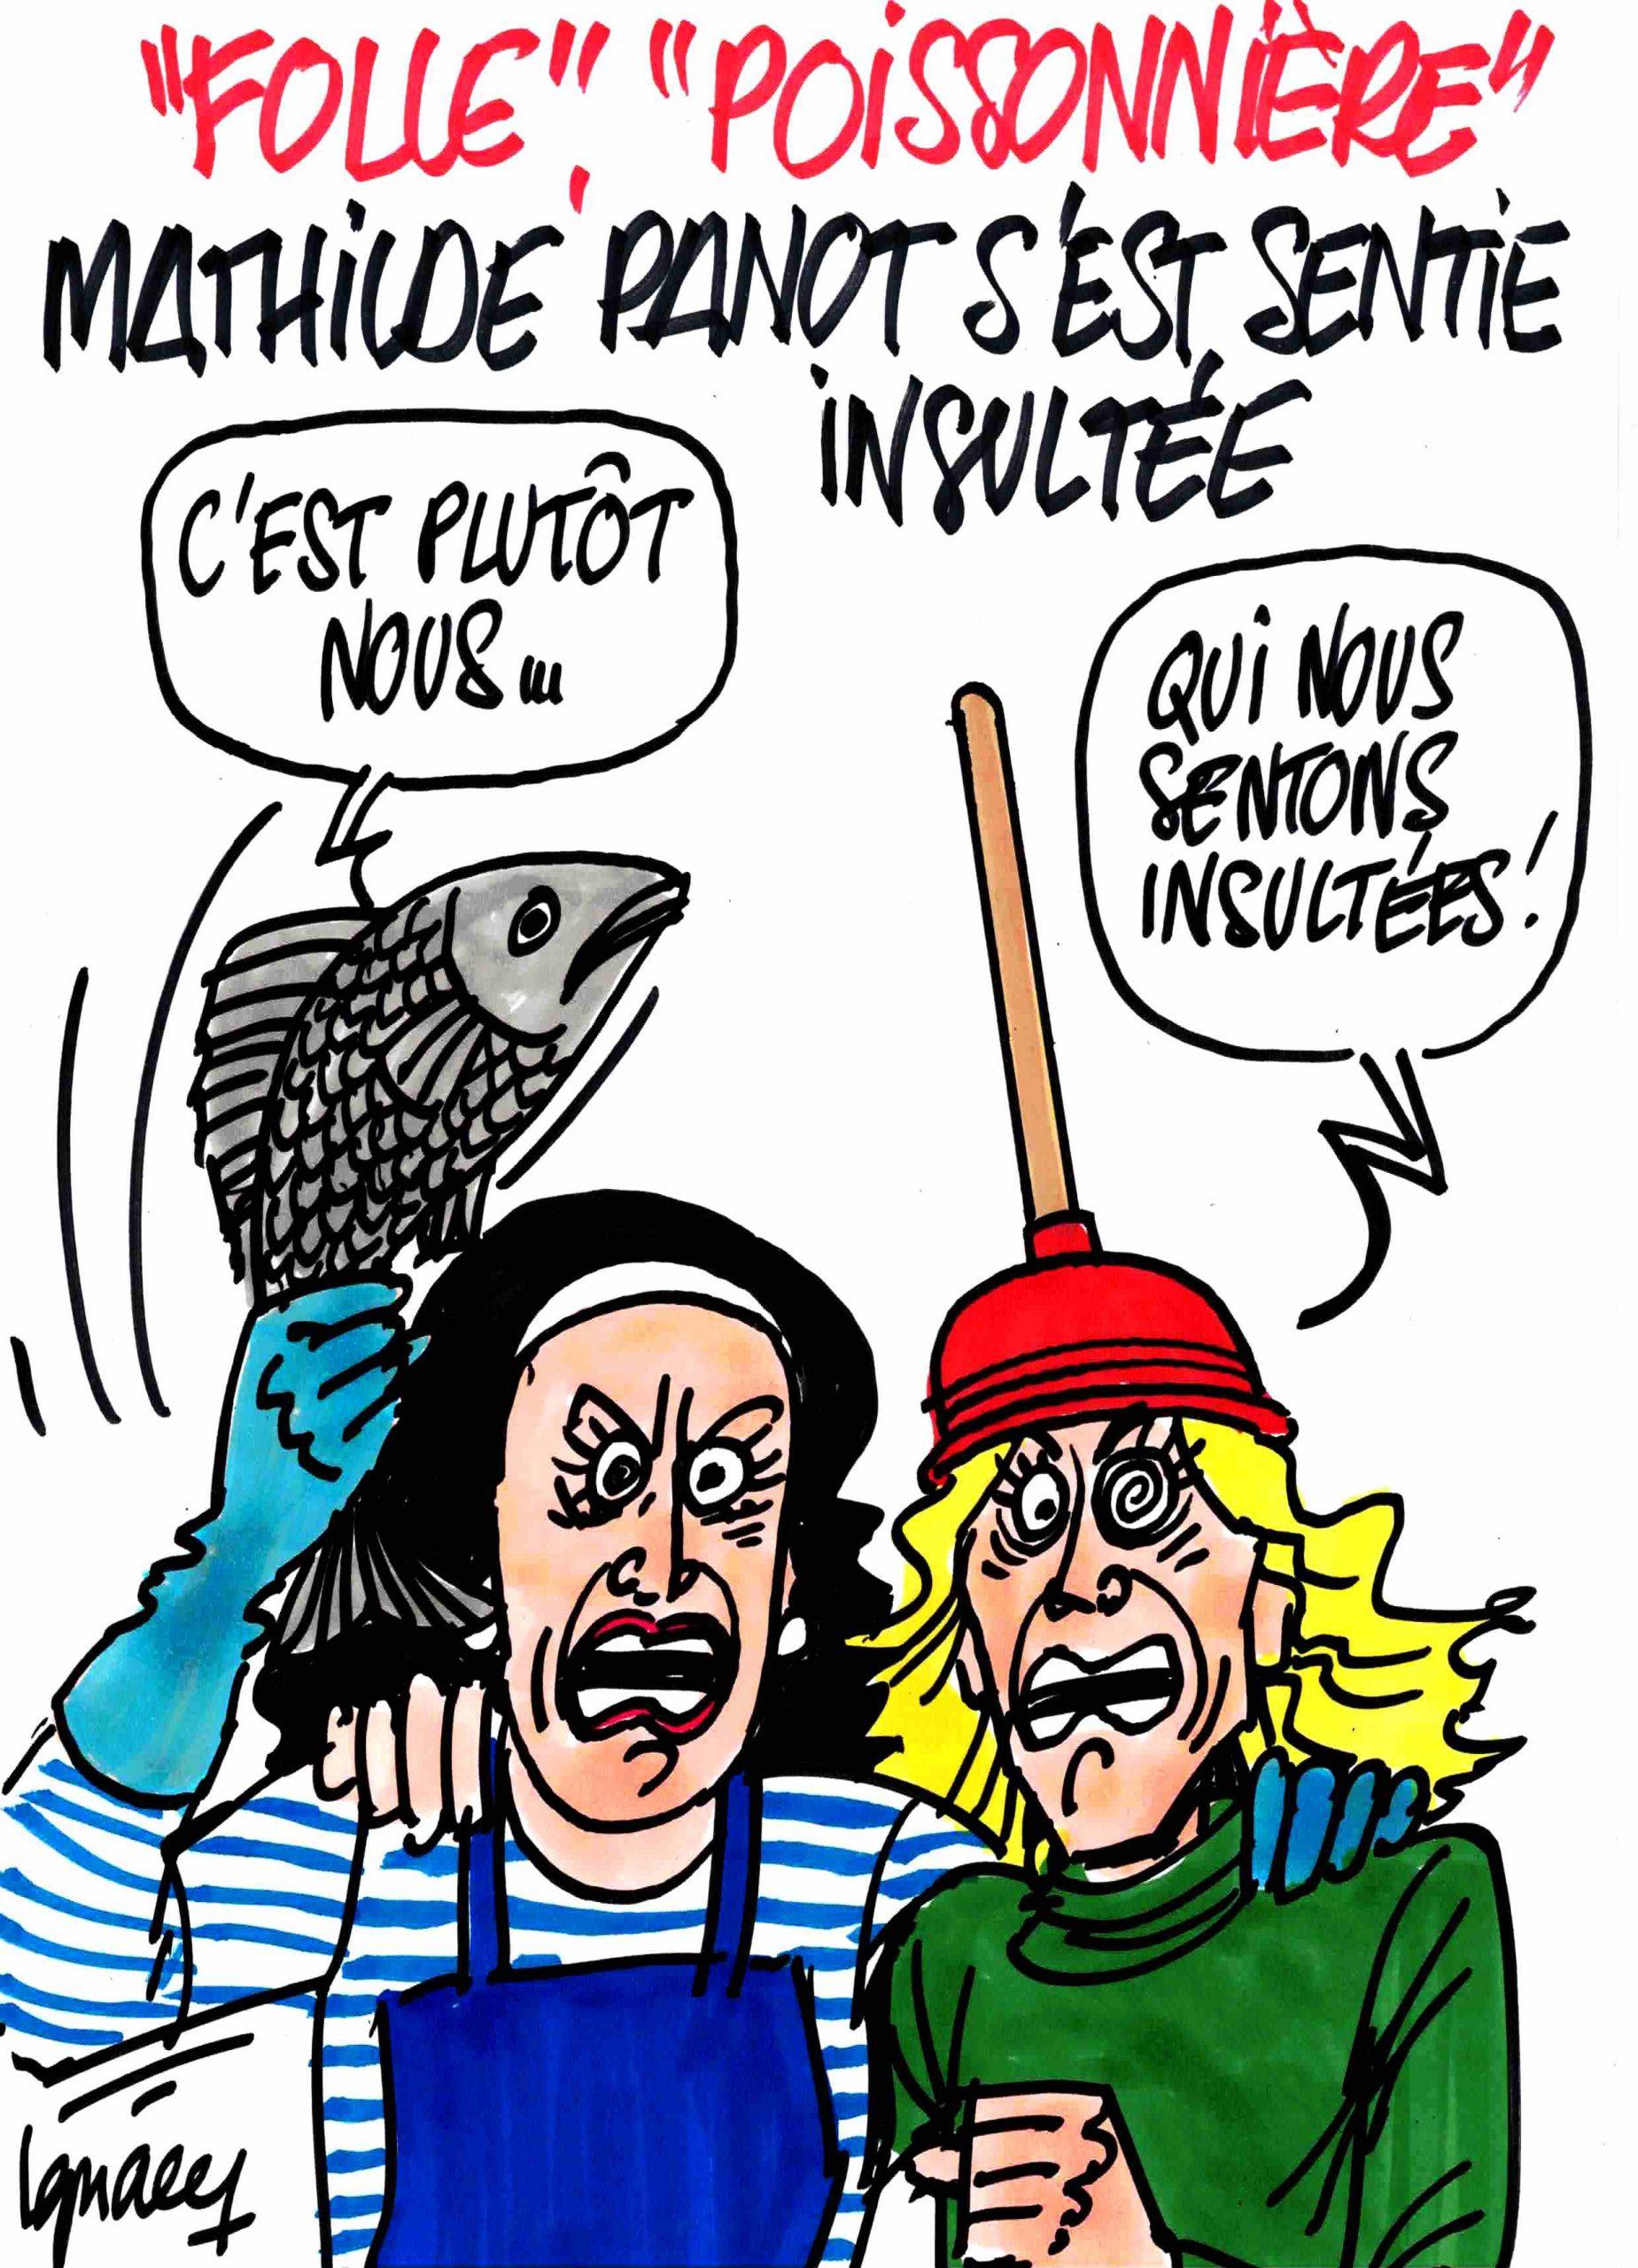 Ignace - Mathilde Panot se sent insultée